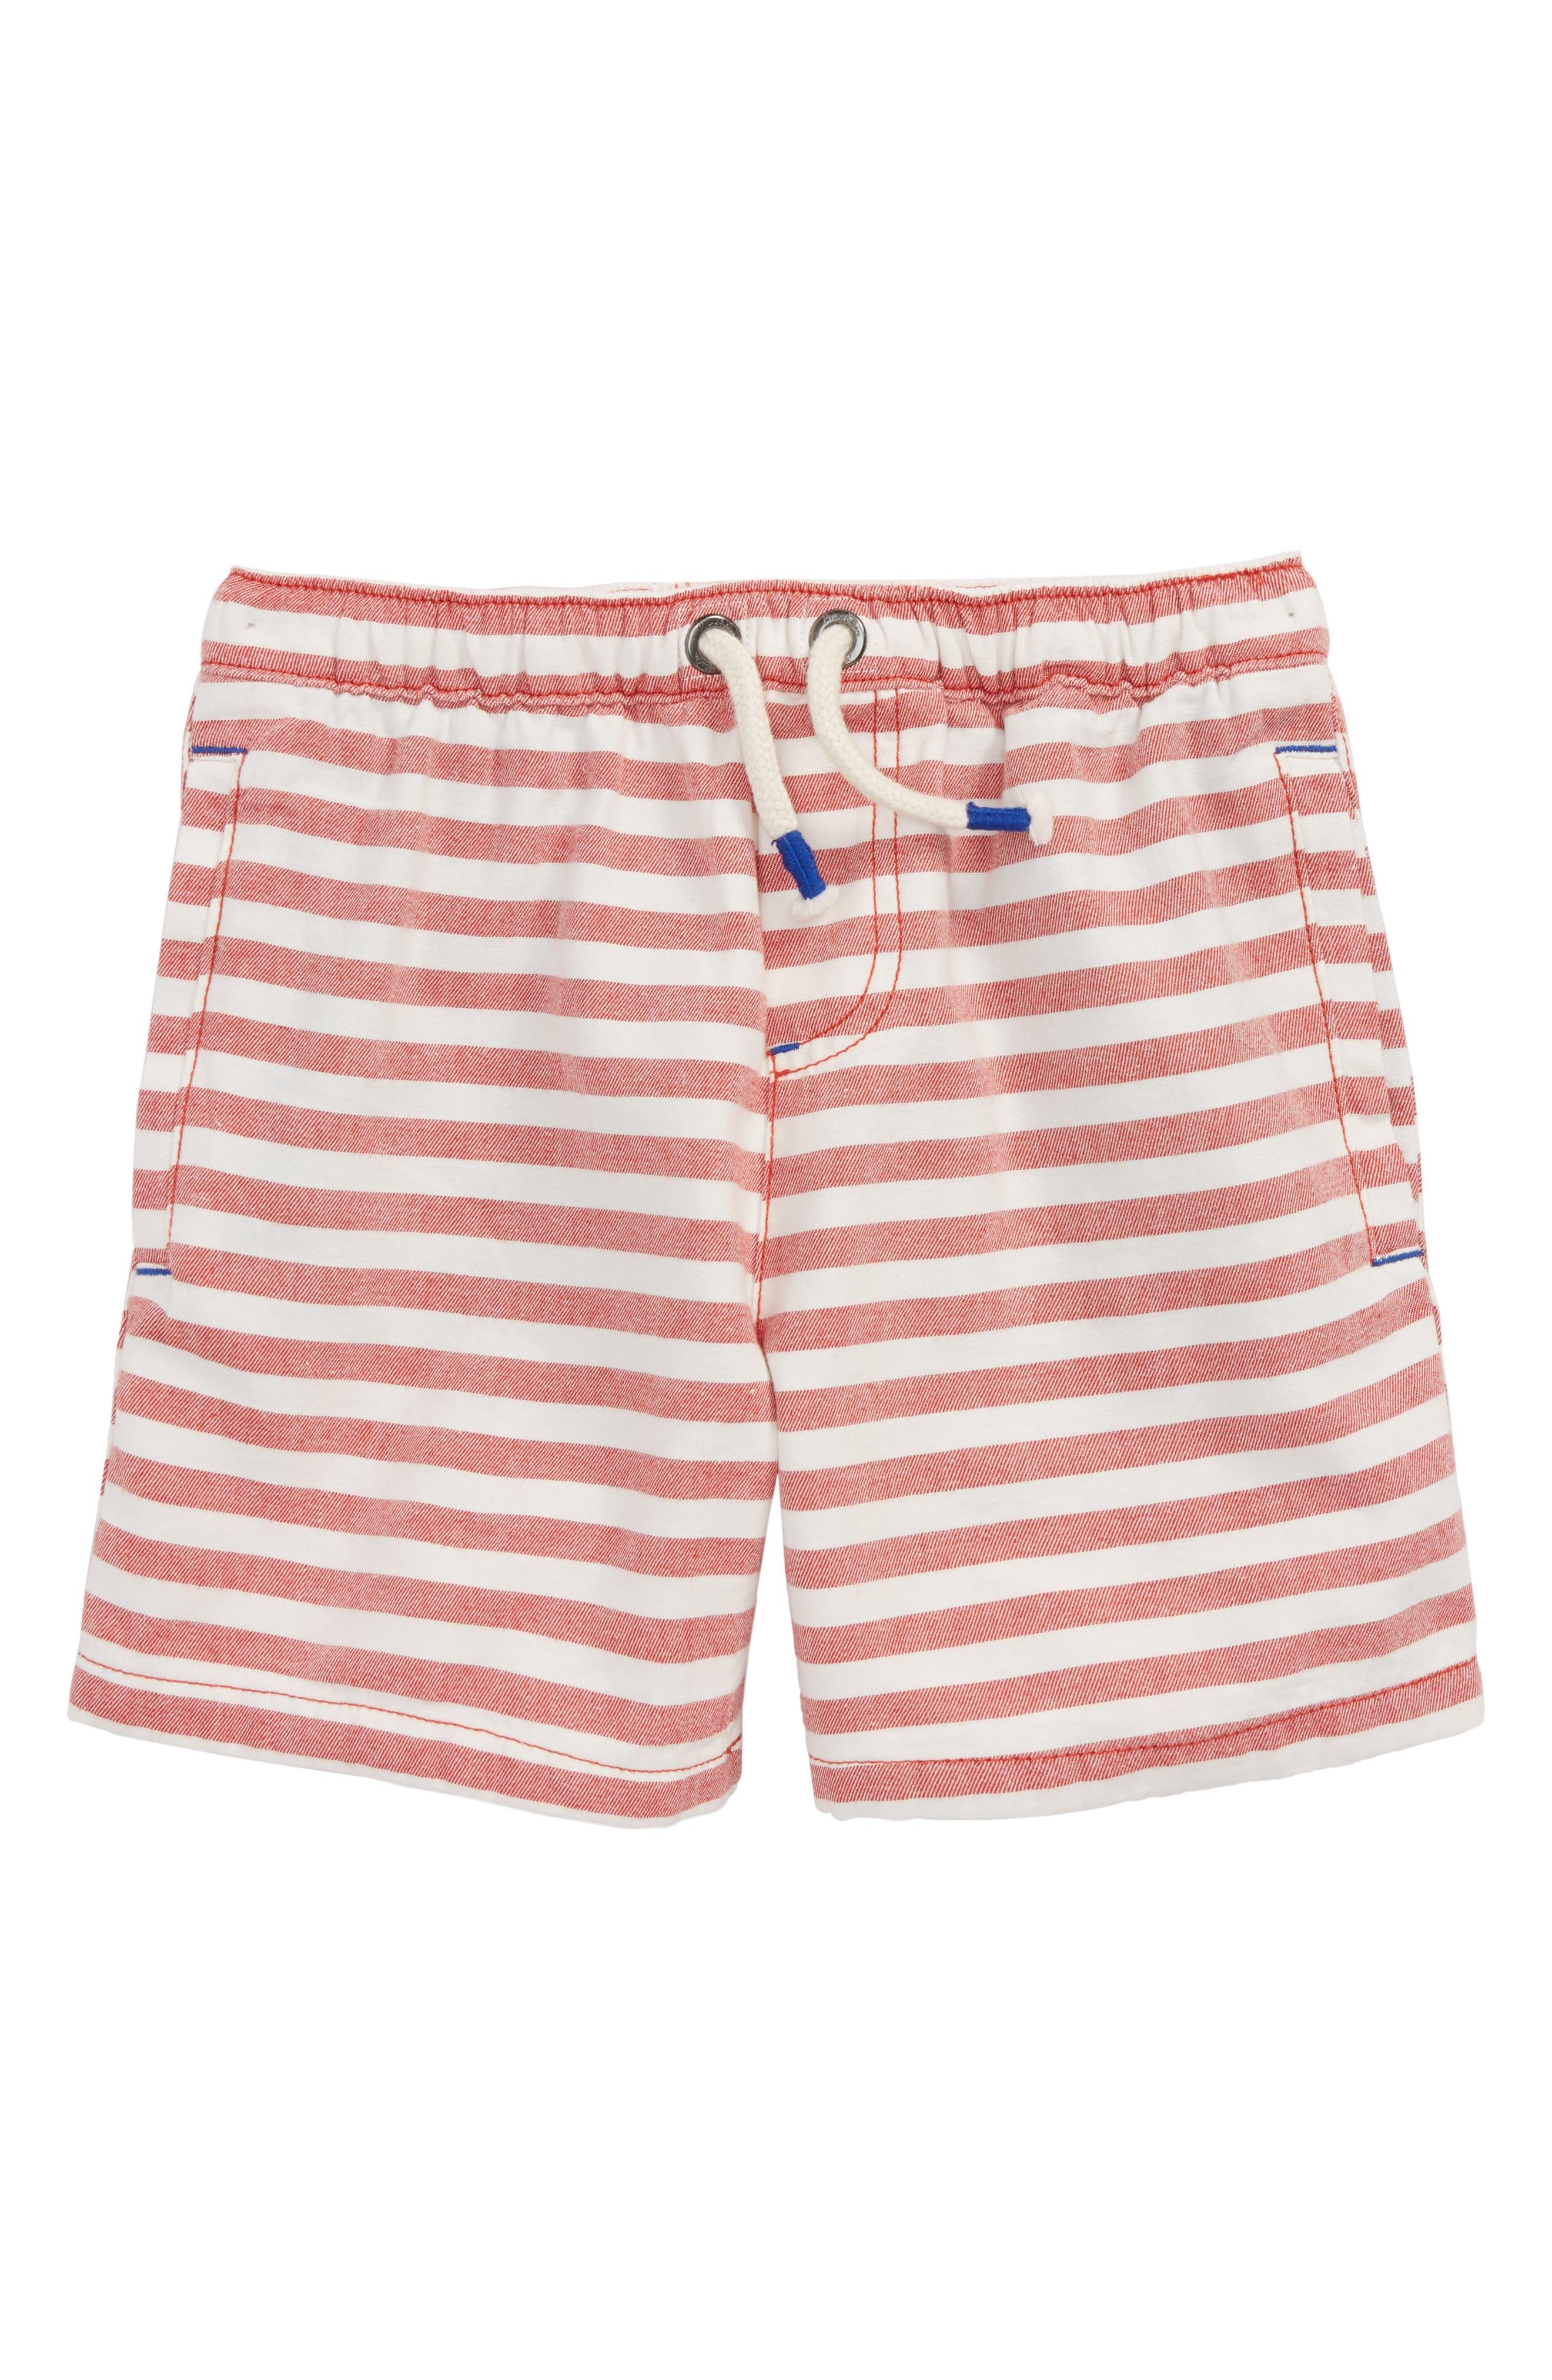 Stripe Drawstring Shorts,                         Main,                         color, Salsa Red/ Ecru